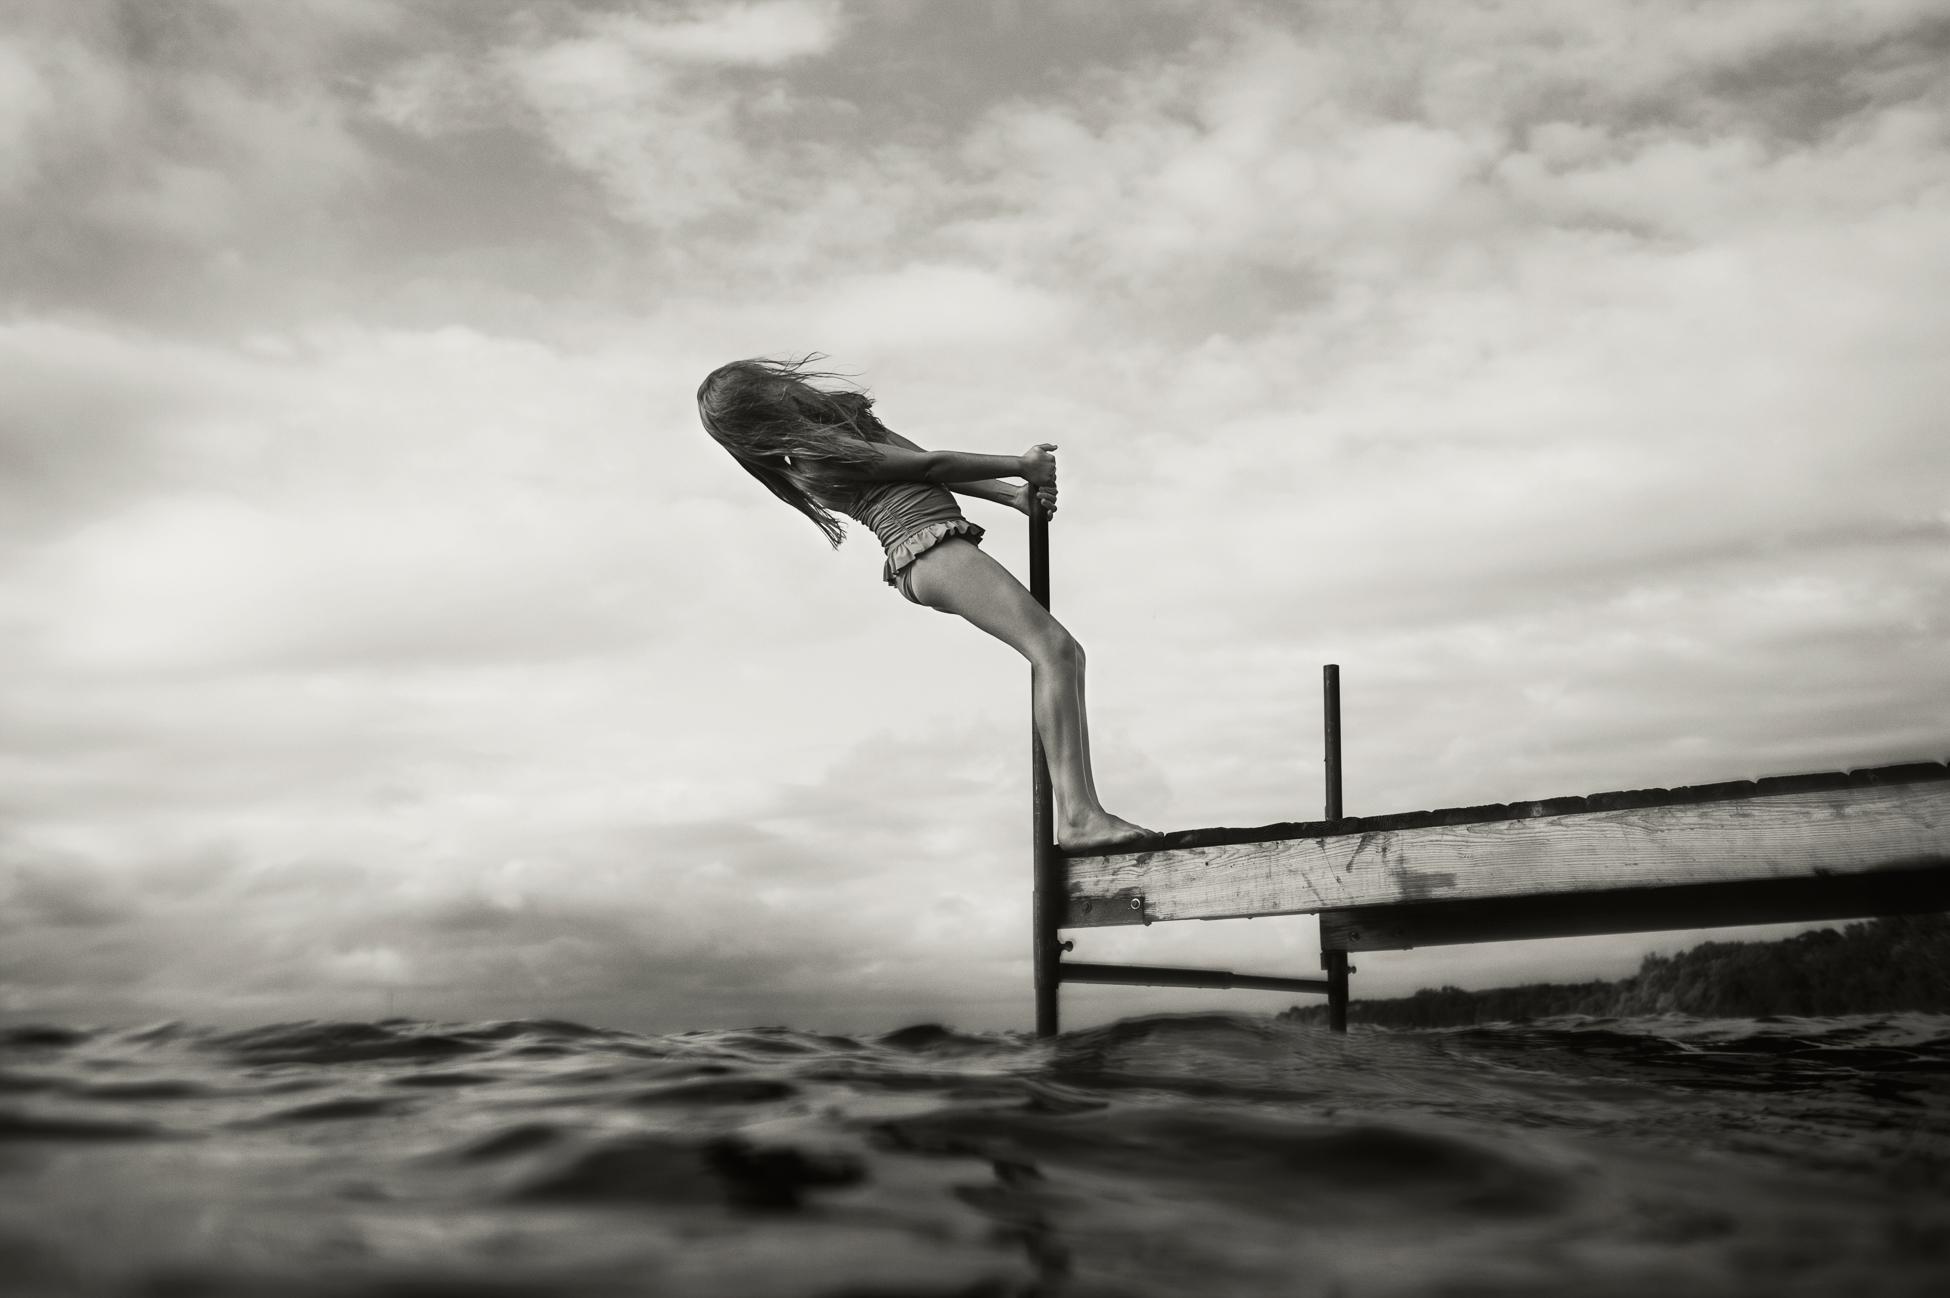 Leaning on Dock, Battle Lake, 2013